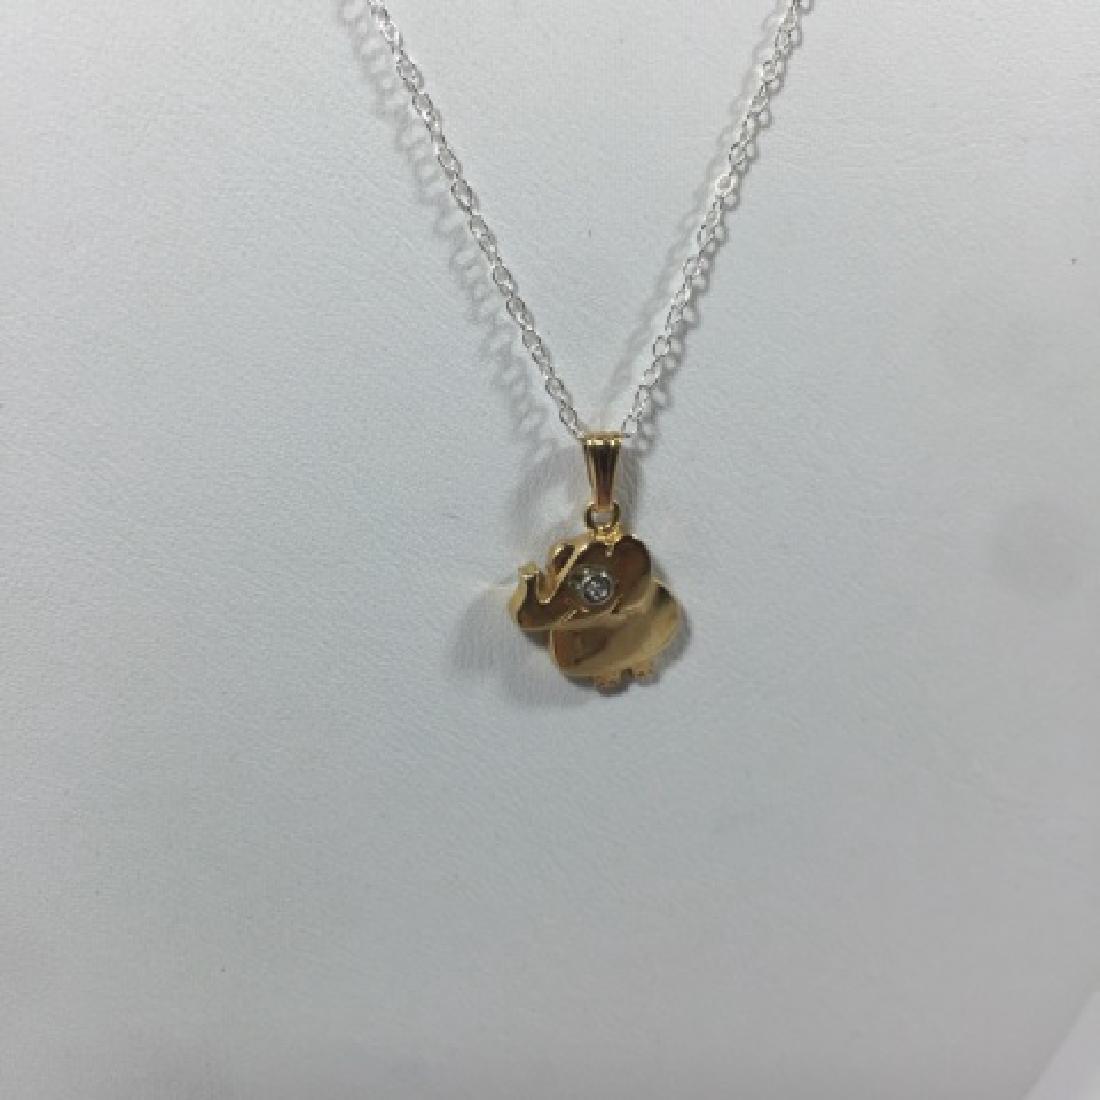 14kt Gold & Diamond Elephant Necklace Pendant - 3